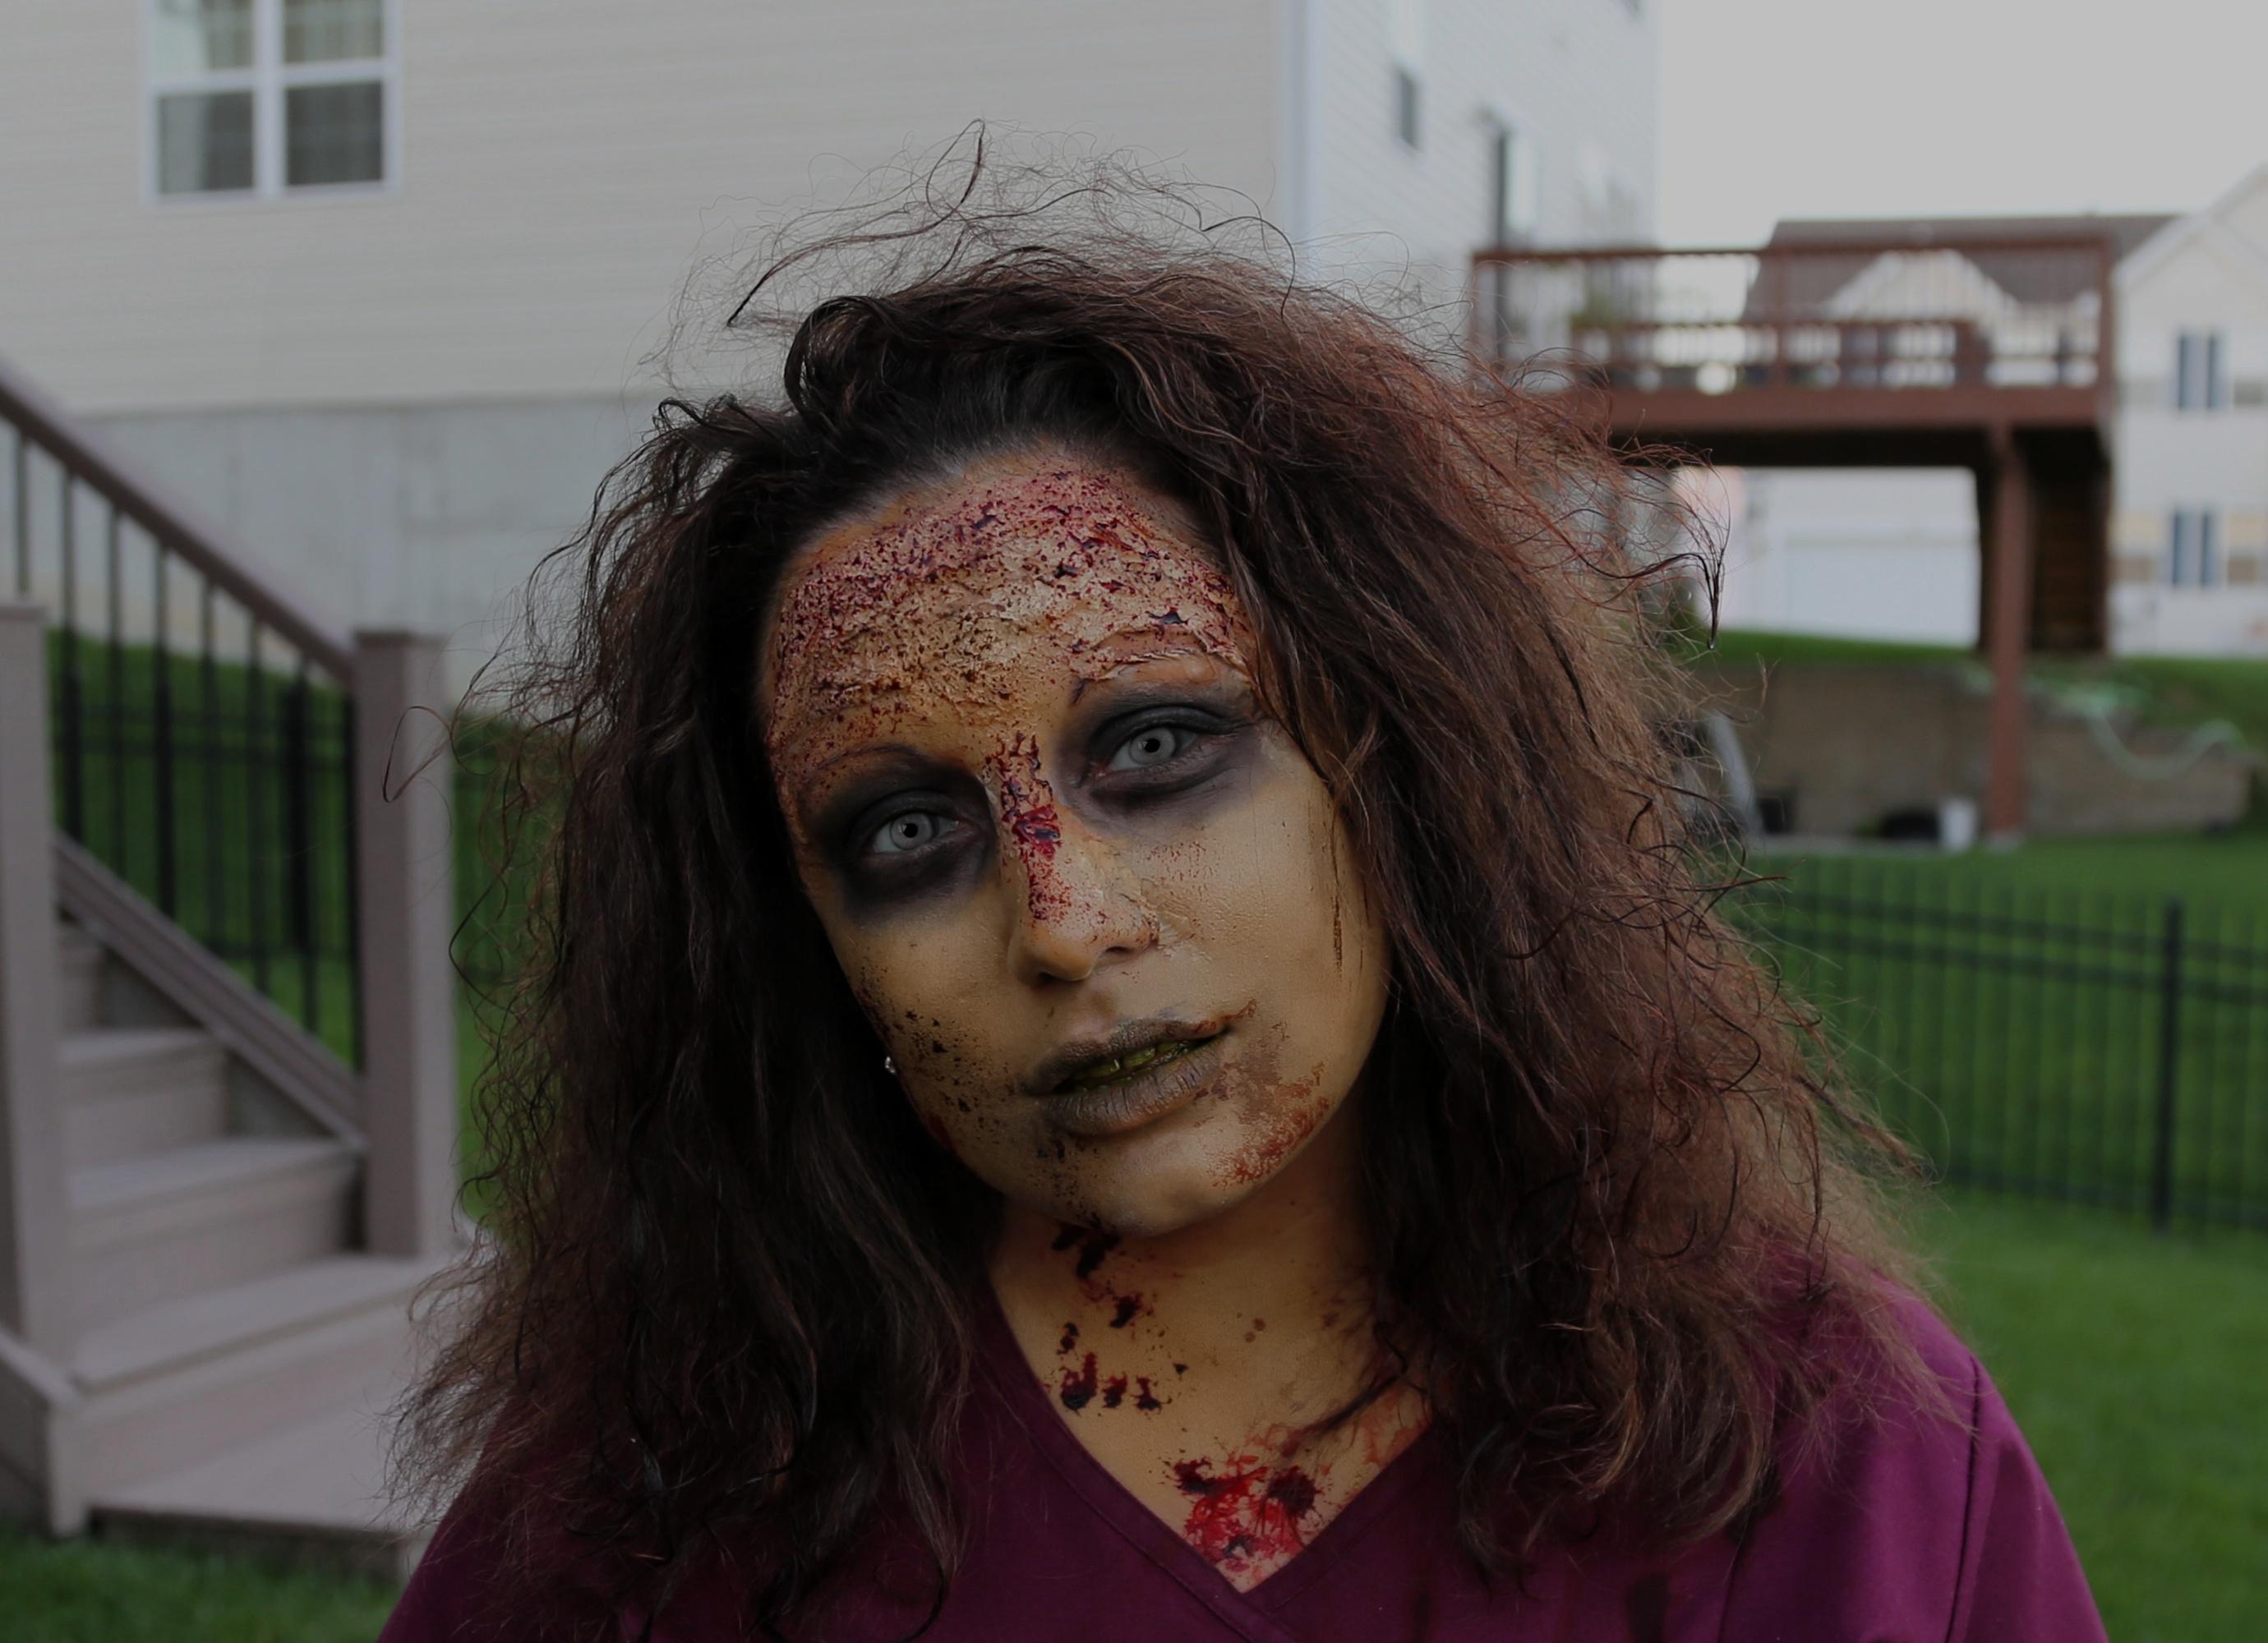 Jamie Zombie - Undead Nightmare_002_00000_pp